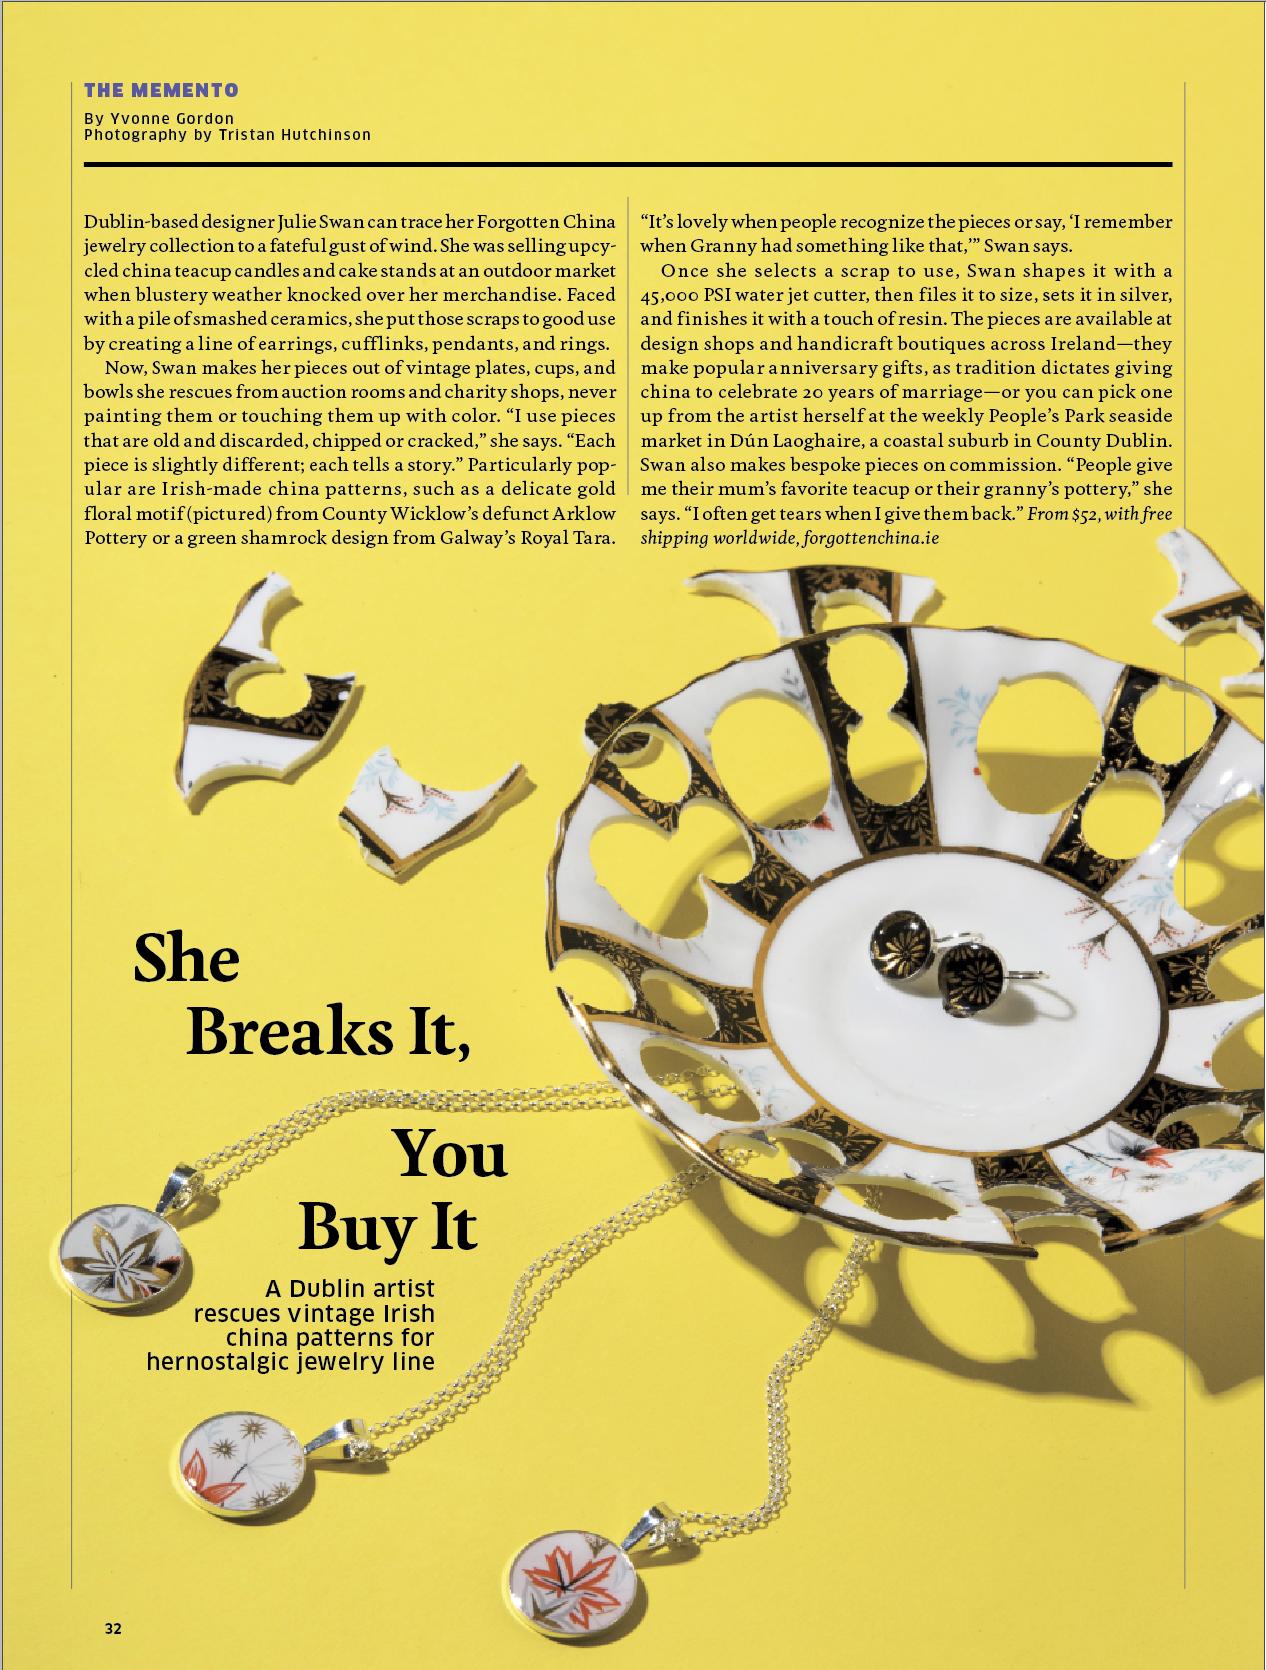 Everyday China for United Airlines' Hemispheres Magazine